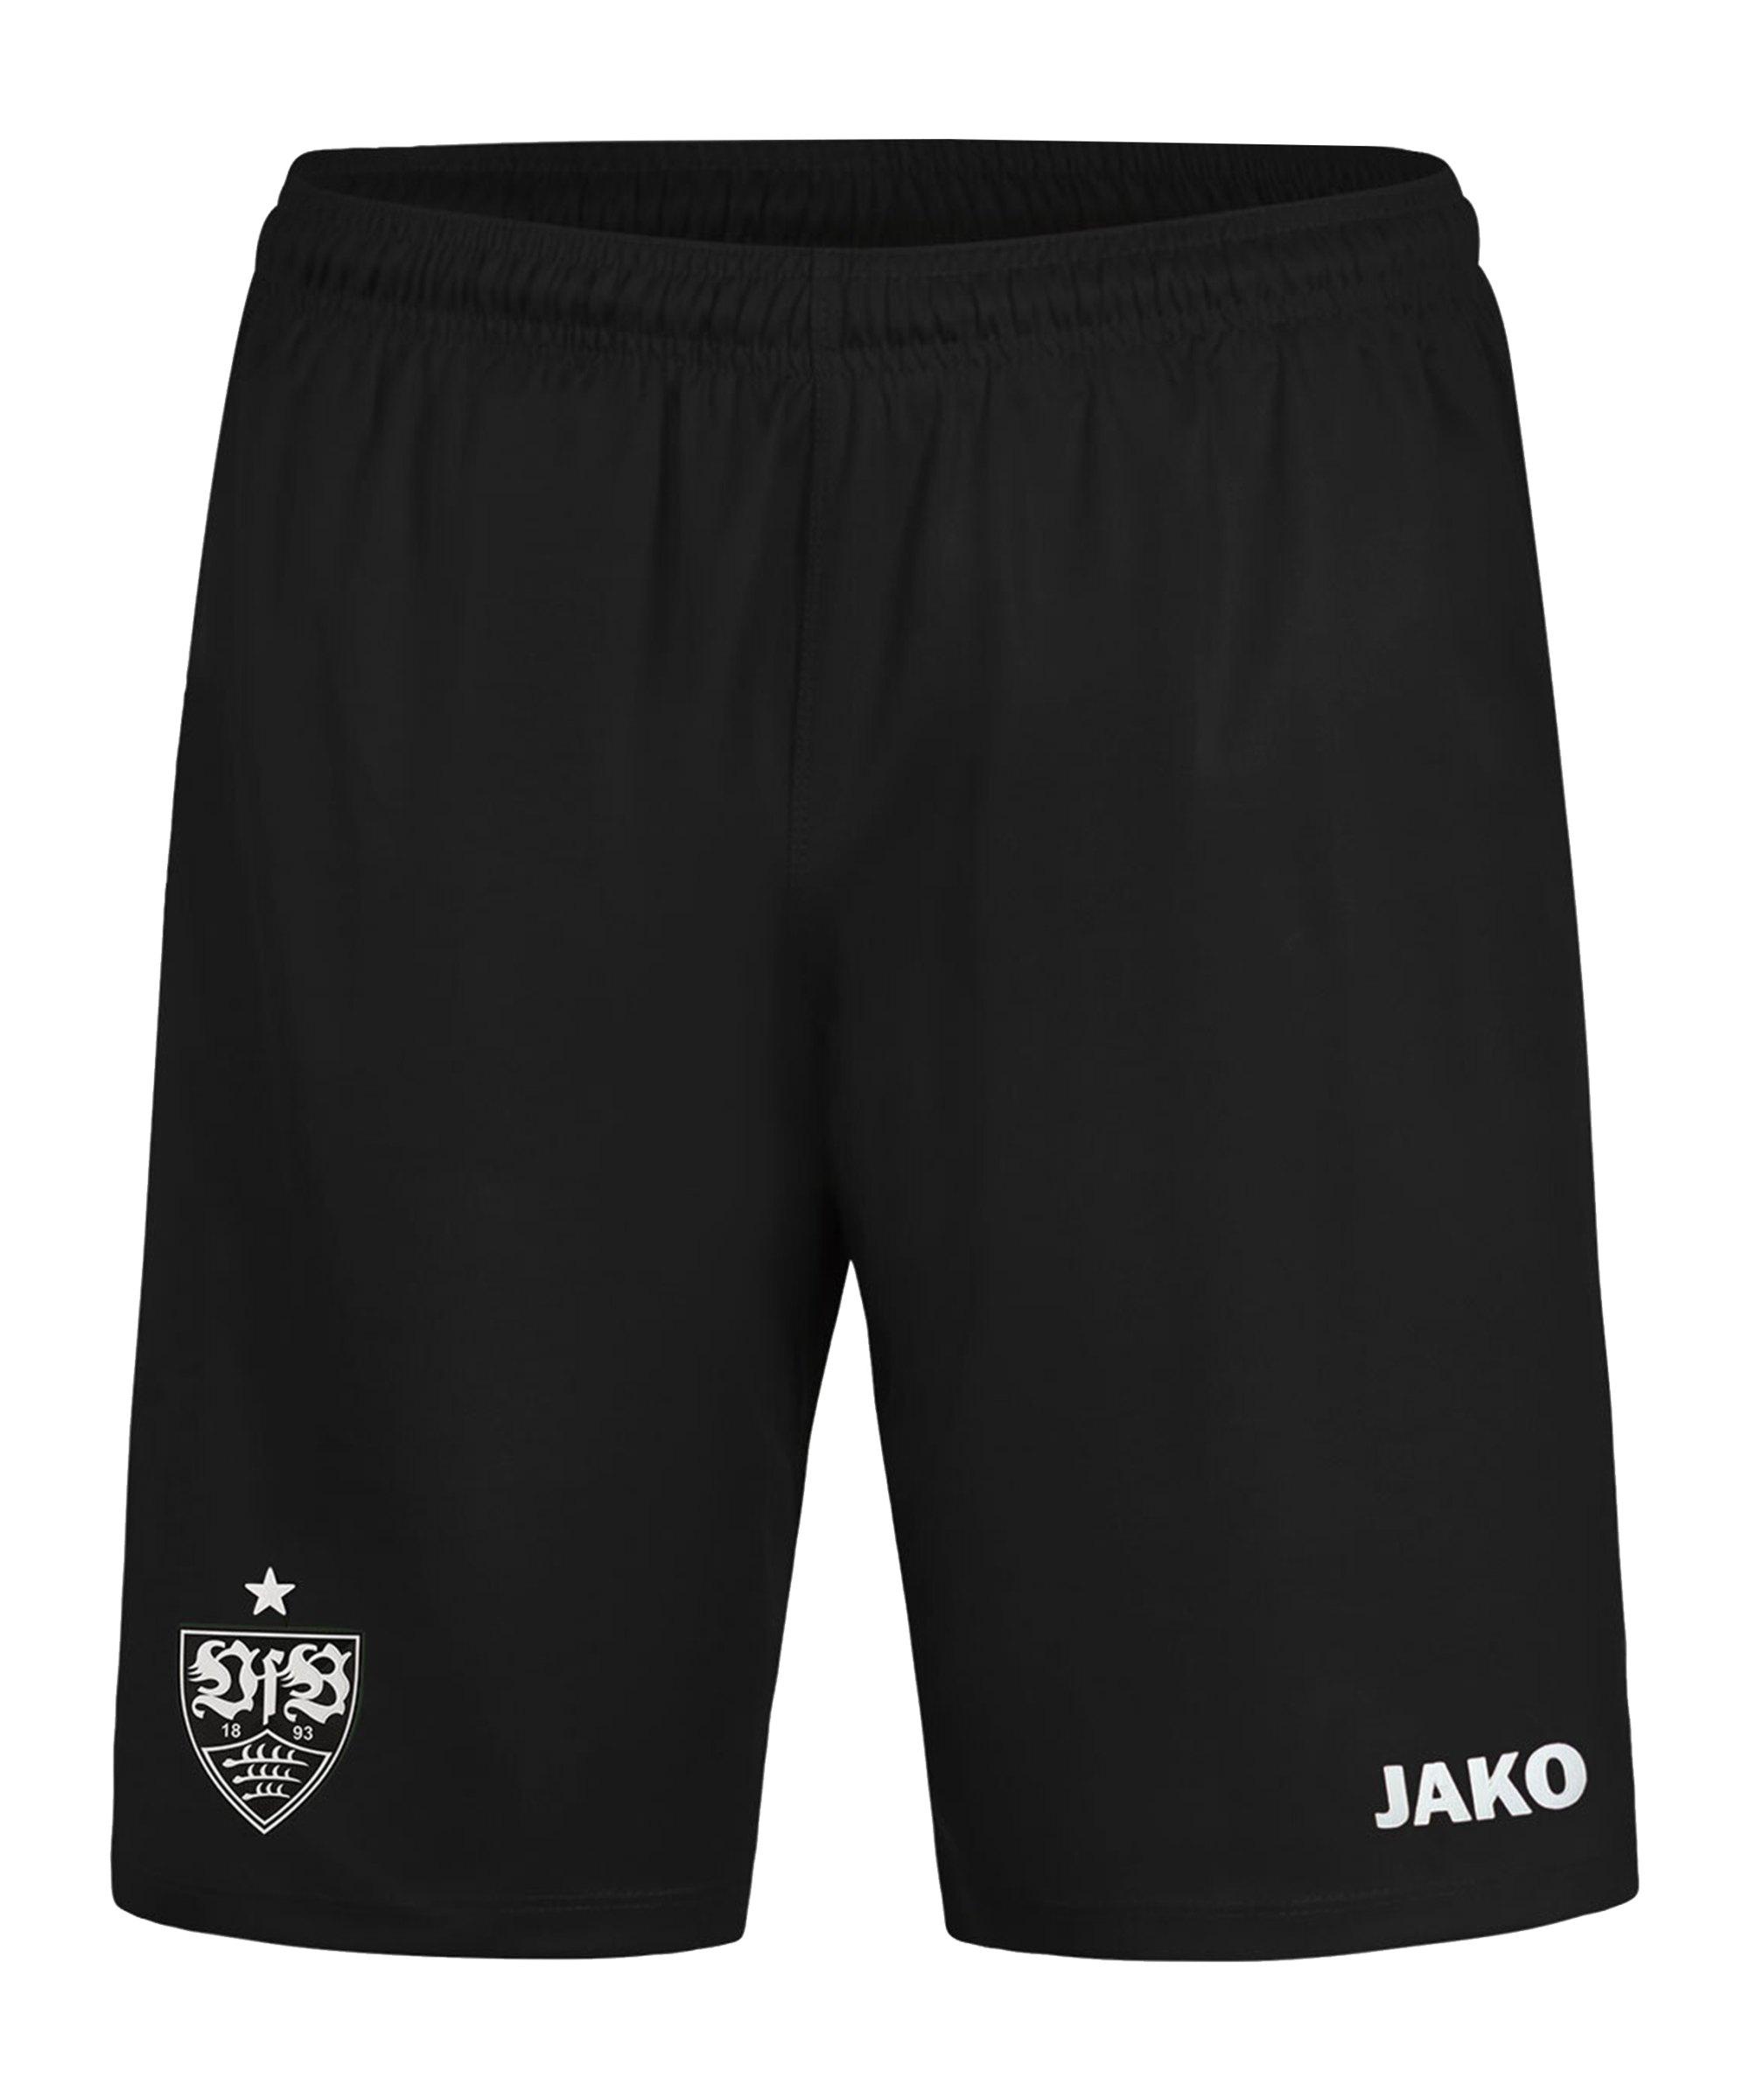 JAKO VfB Stuttgart Short Away 2020/2021 Schwarz F08 - schwarz